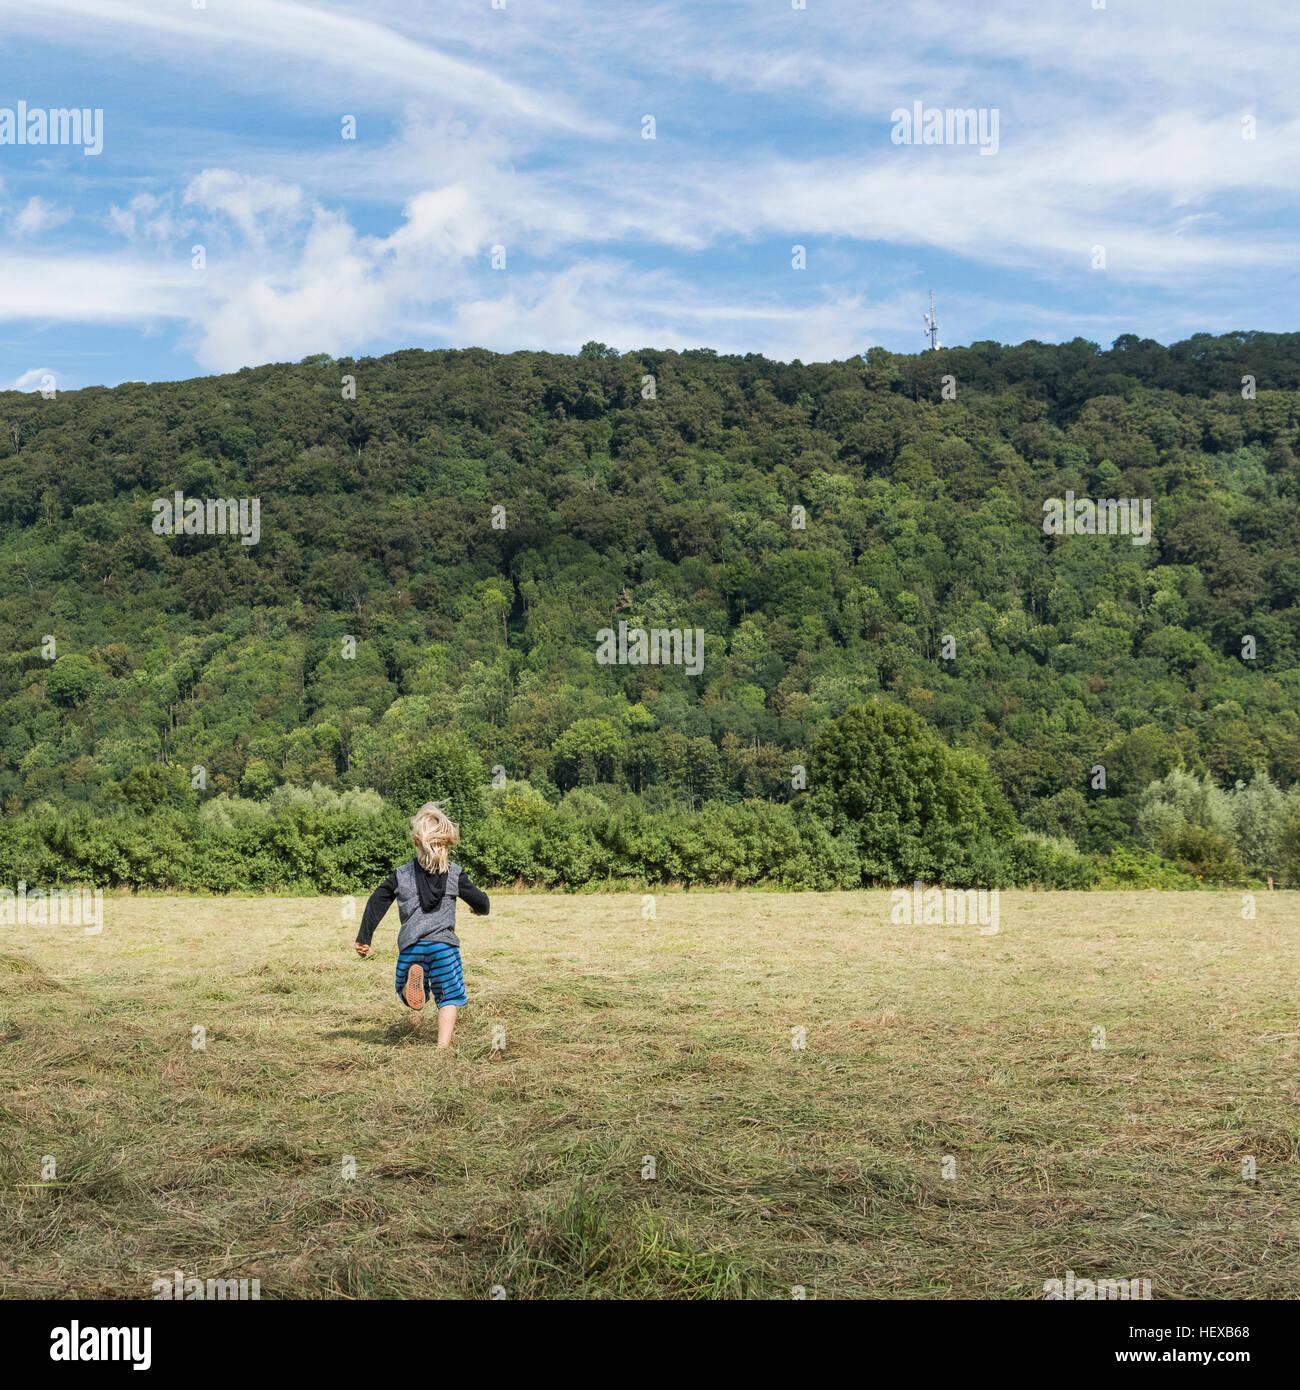 Rear view of boy running in field, Porta Westfalica, North Rhine Westphalia, Germany Stock Photo